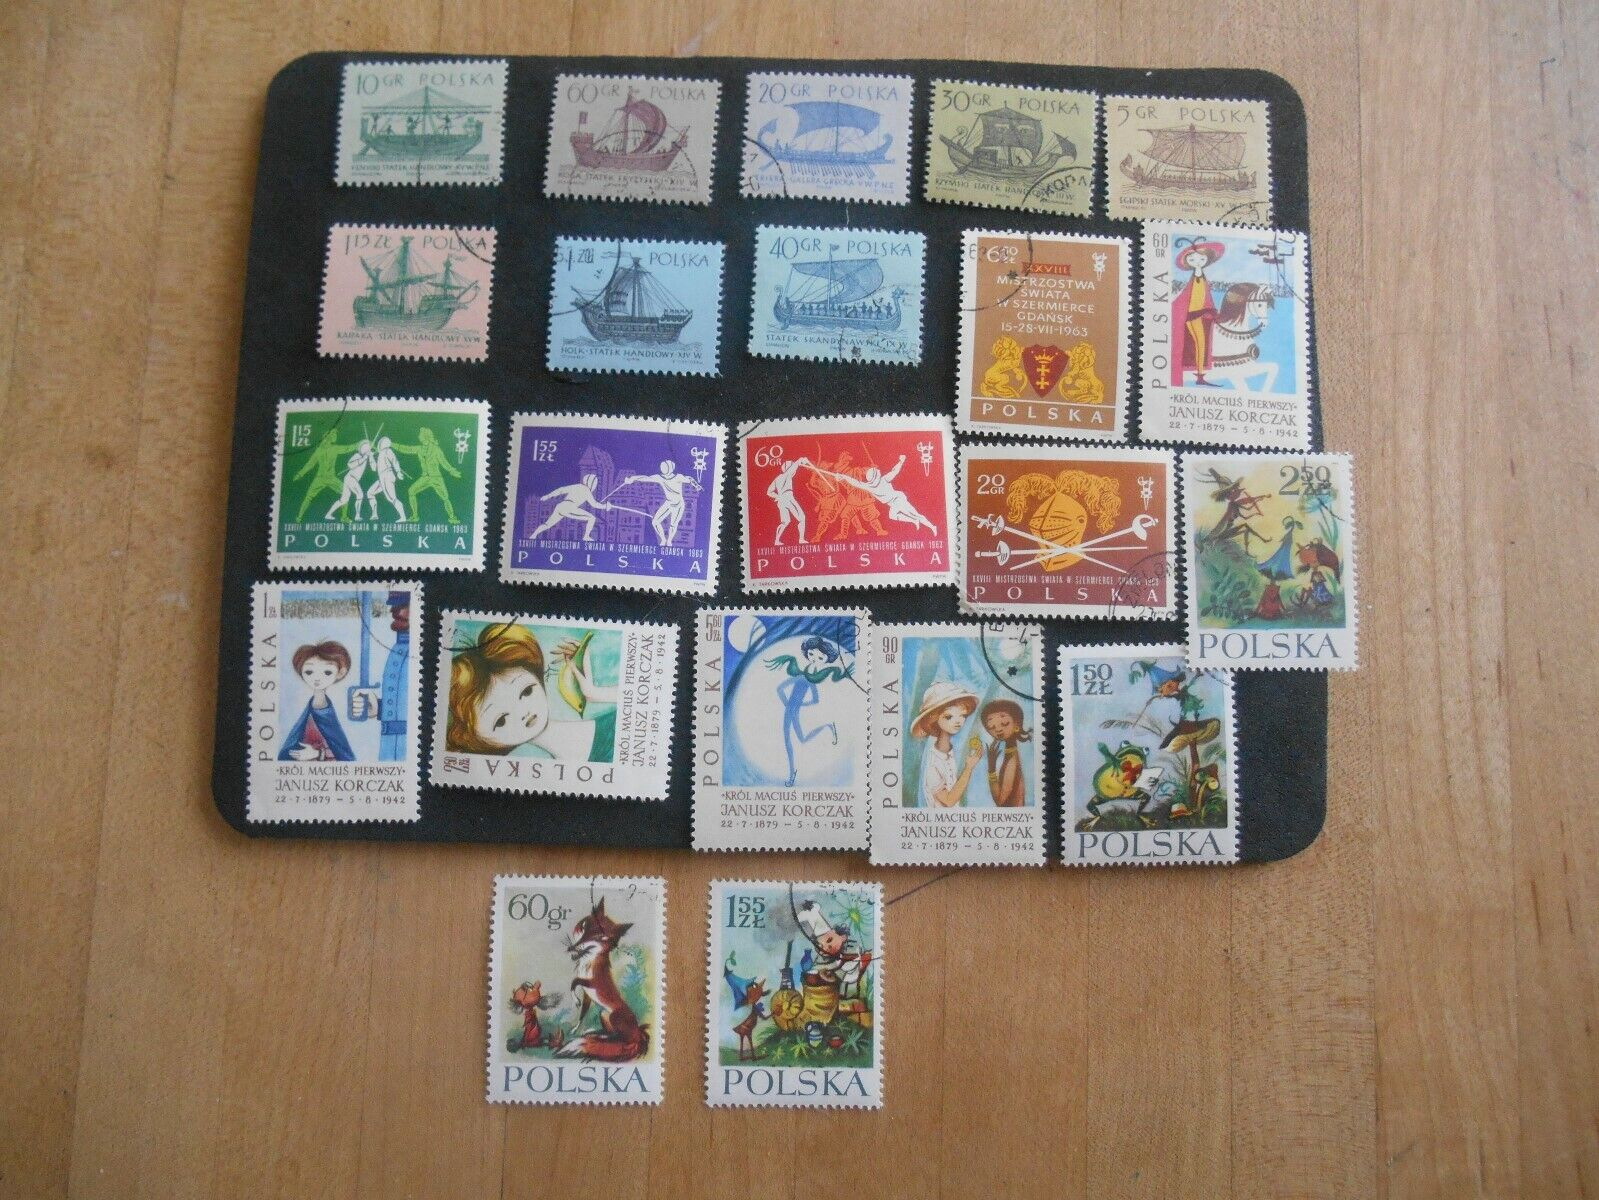 1964 Poland Sc 1206-1213, Ships Stamps, Canceled. - $2.50